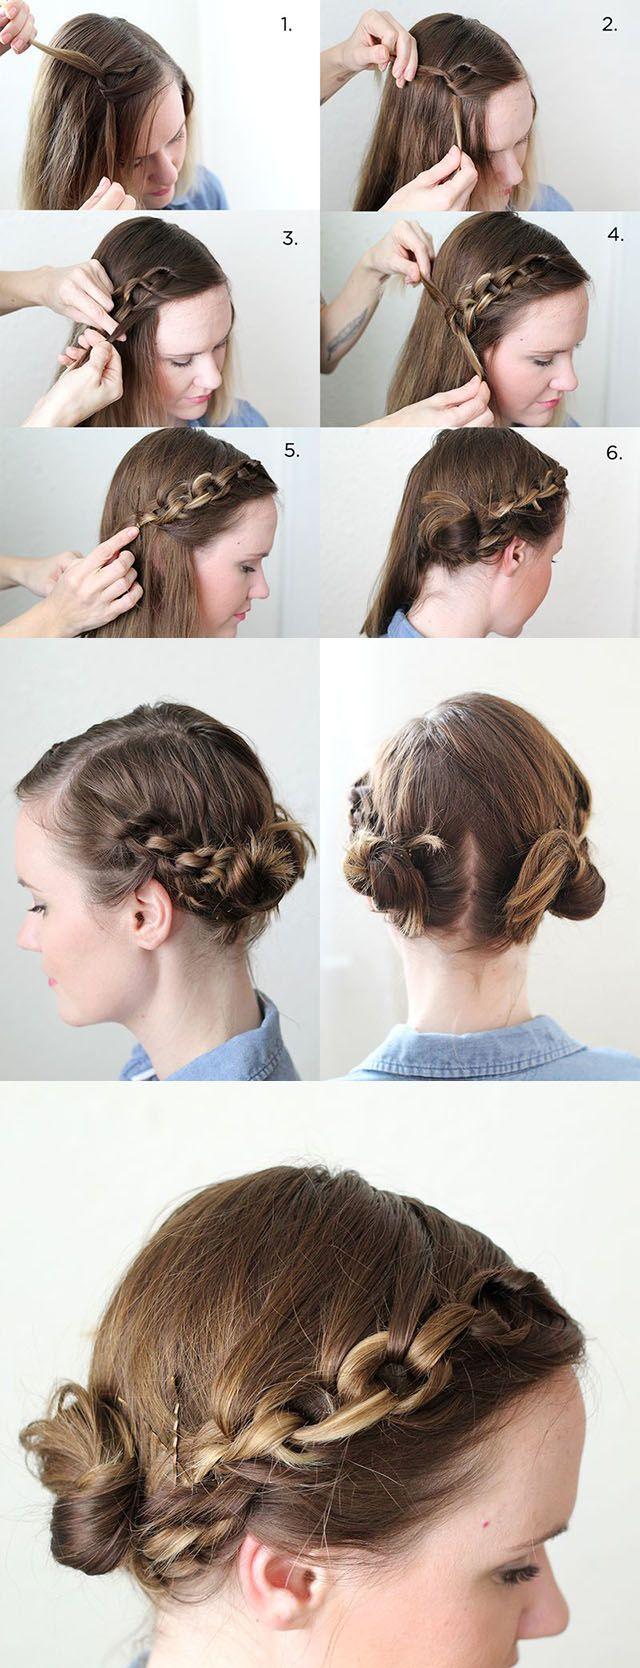 Fabulous Hairstyle Tutorials For Diva Like You - Fashion Diva Design